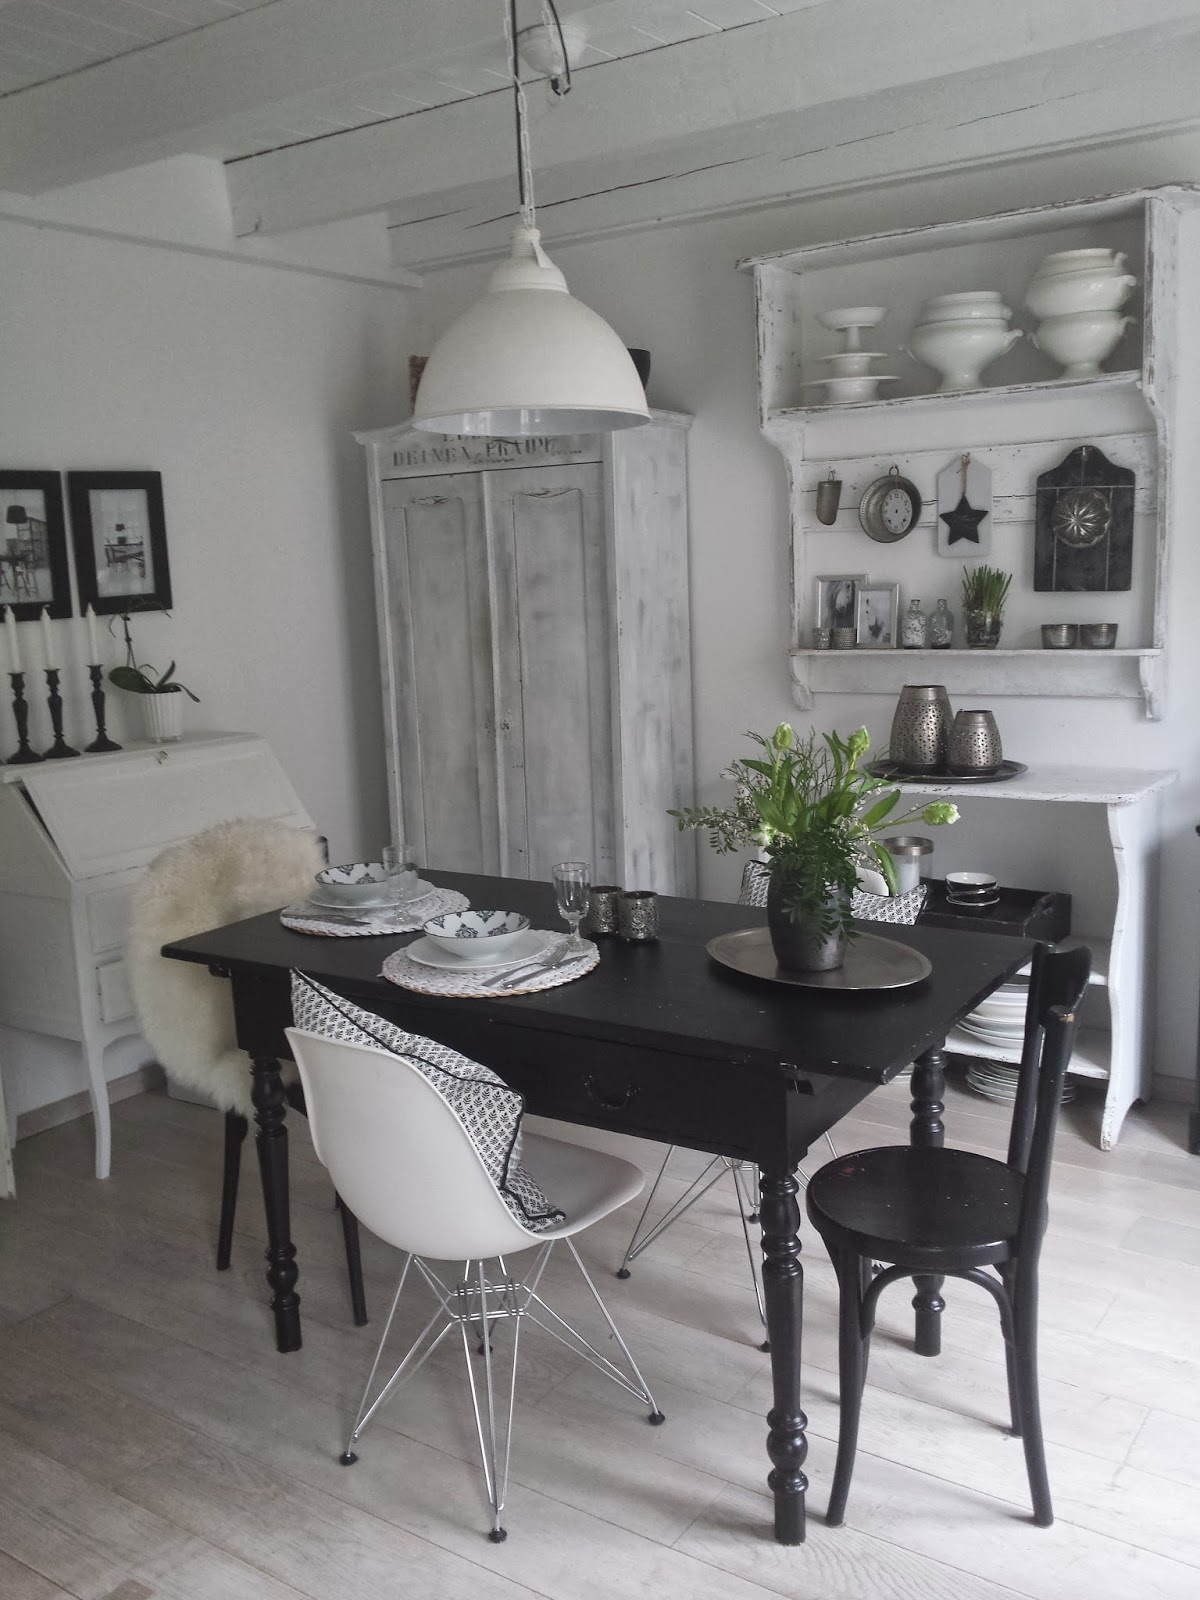 frau k shabby chic schwarzer tisch. Black Bedroom Furniture Sets. Home Design Ideas